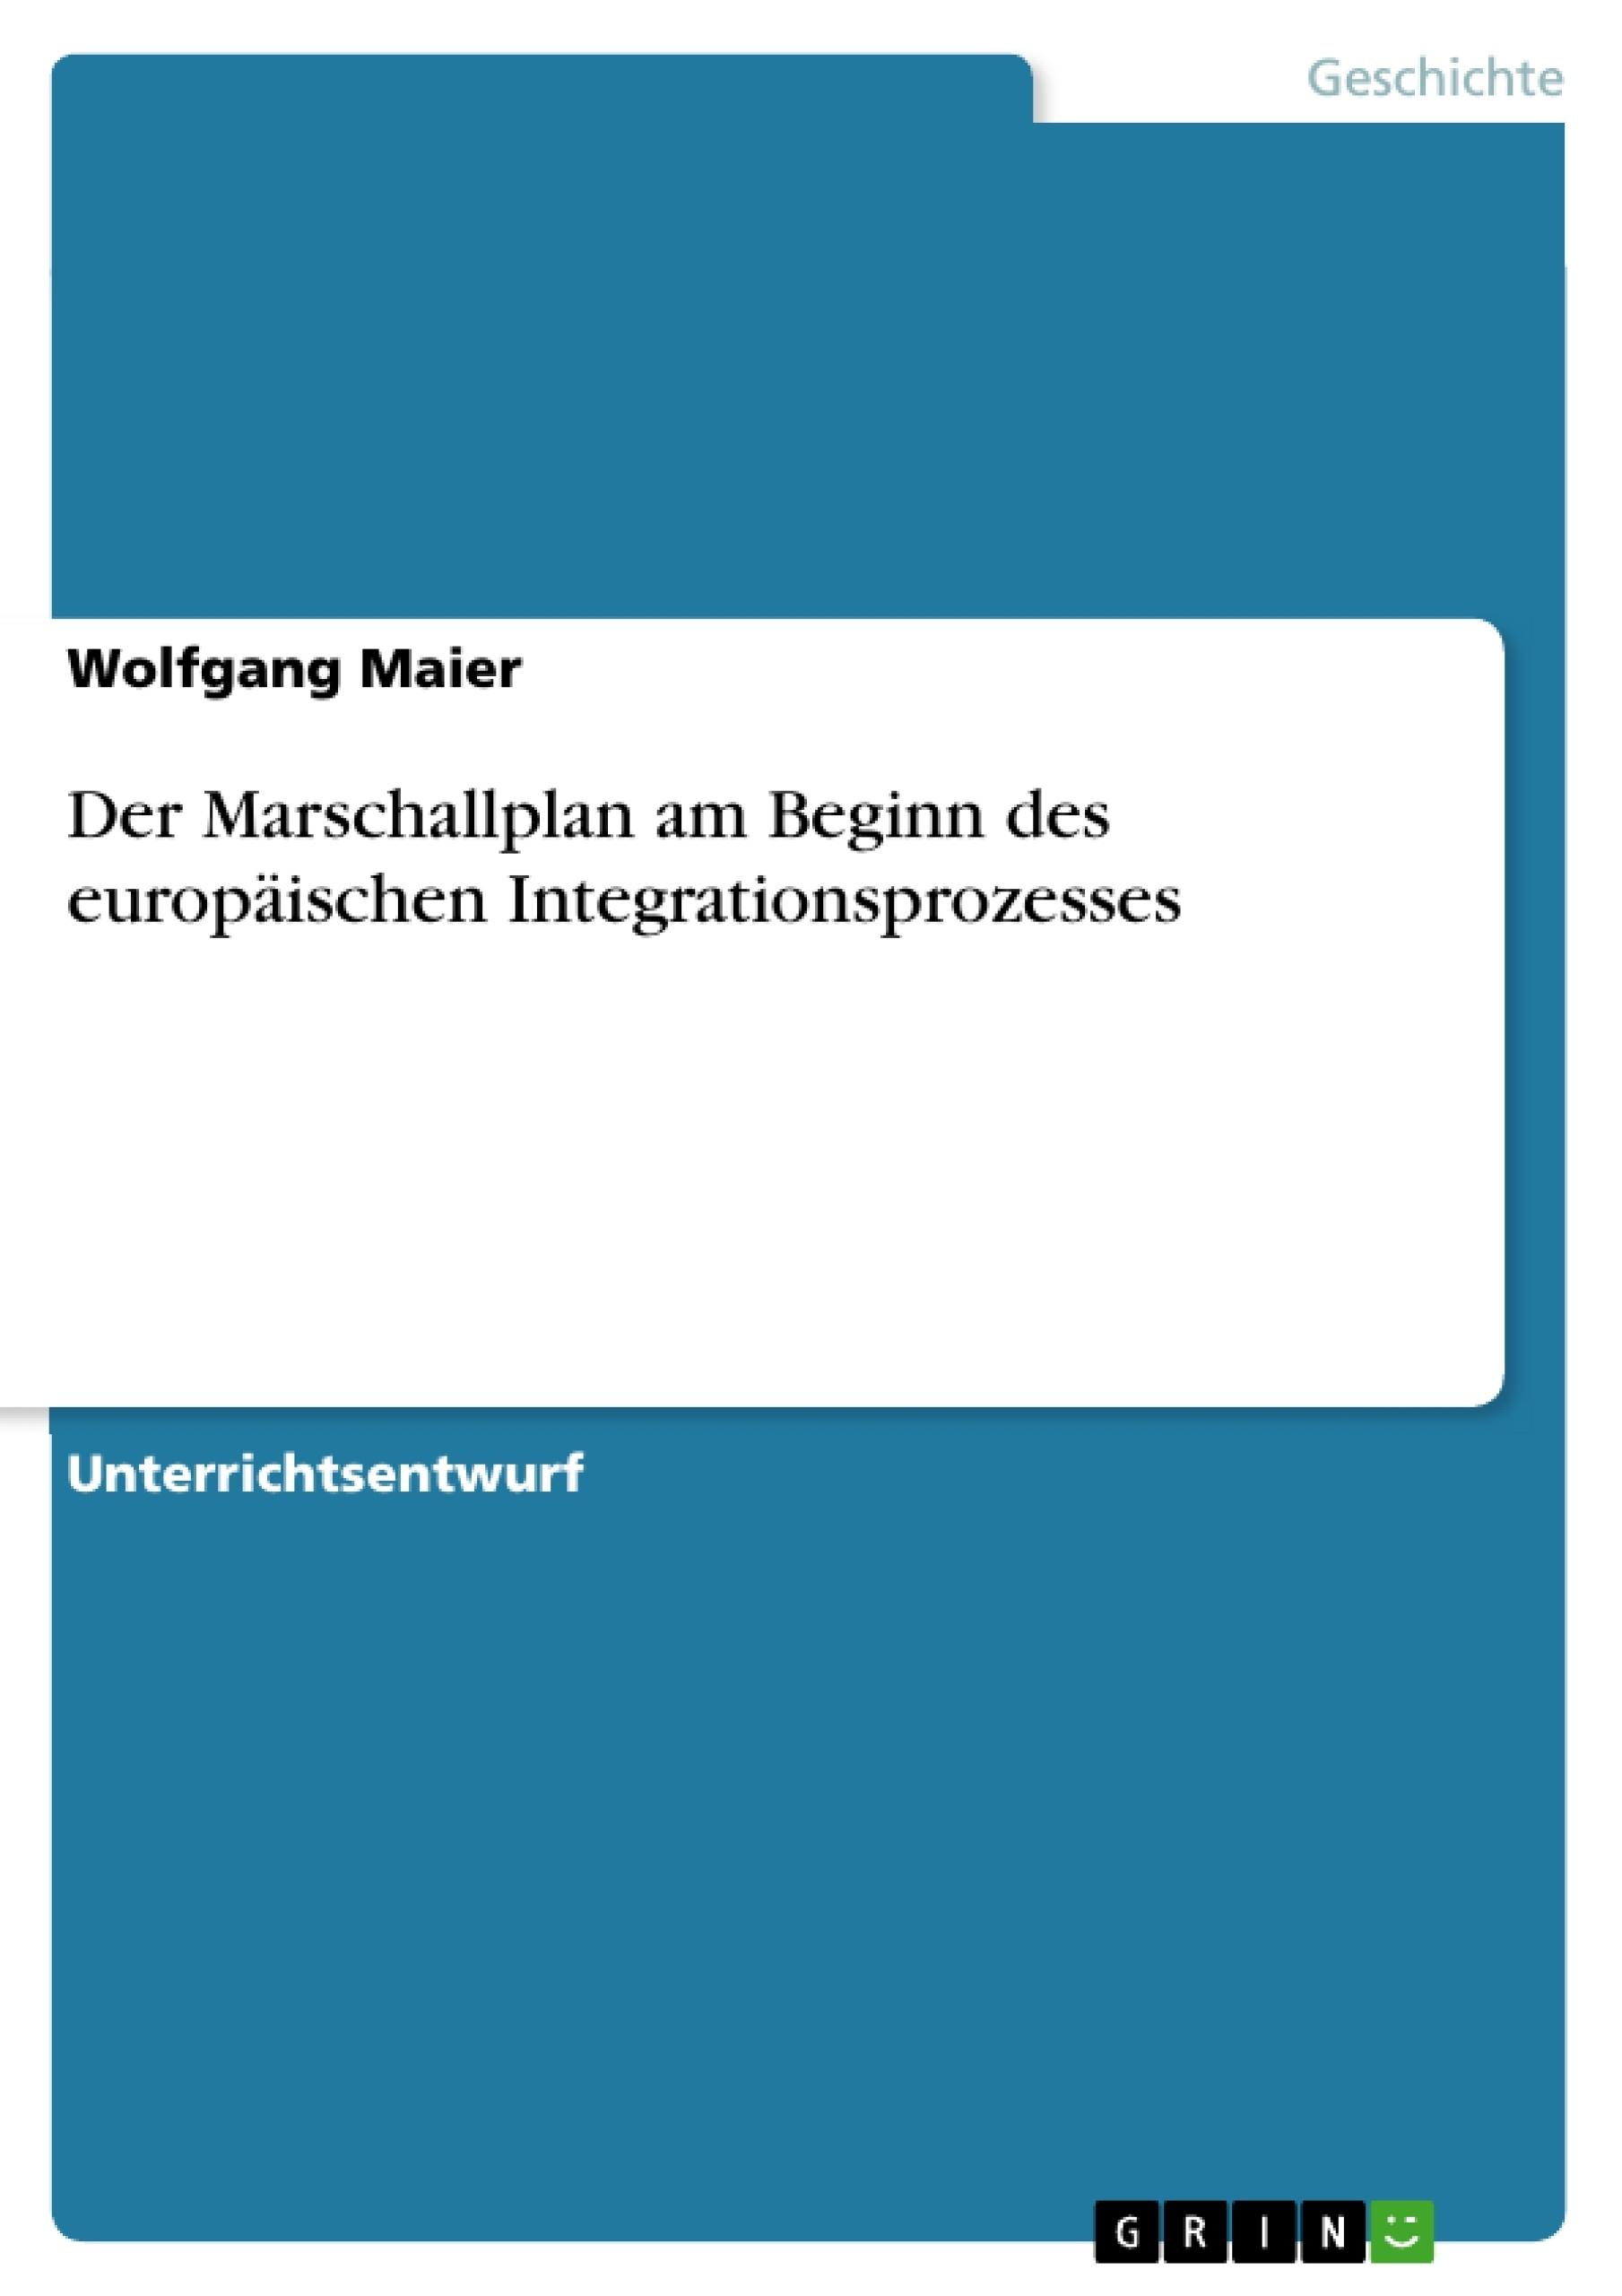 Titel: Der Marschallplan am Beginn des europäischen Integrationsprozesses